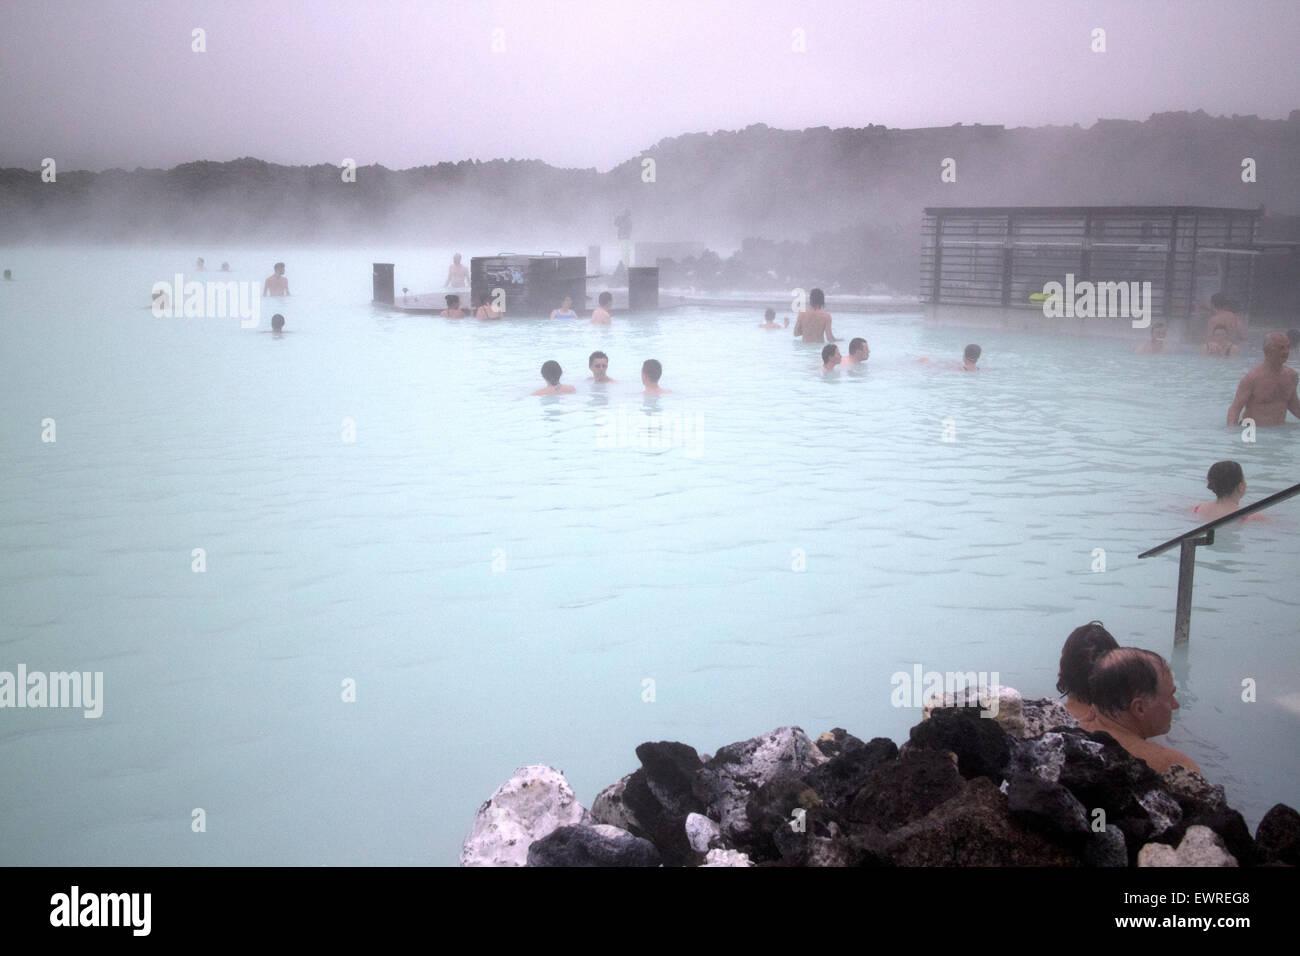 Touristen in der blauen Lagune Therme in nebligen kaltem Wetter Island Stockbild